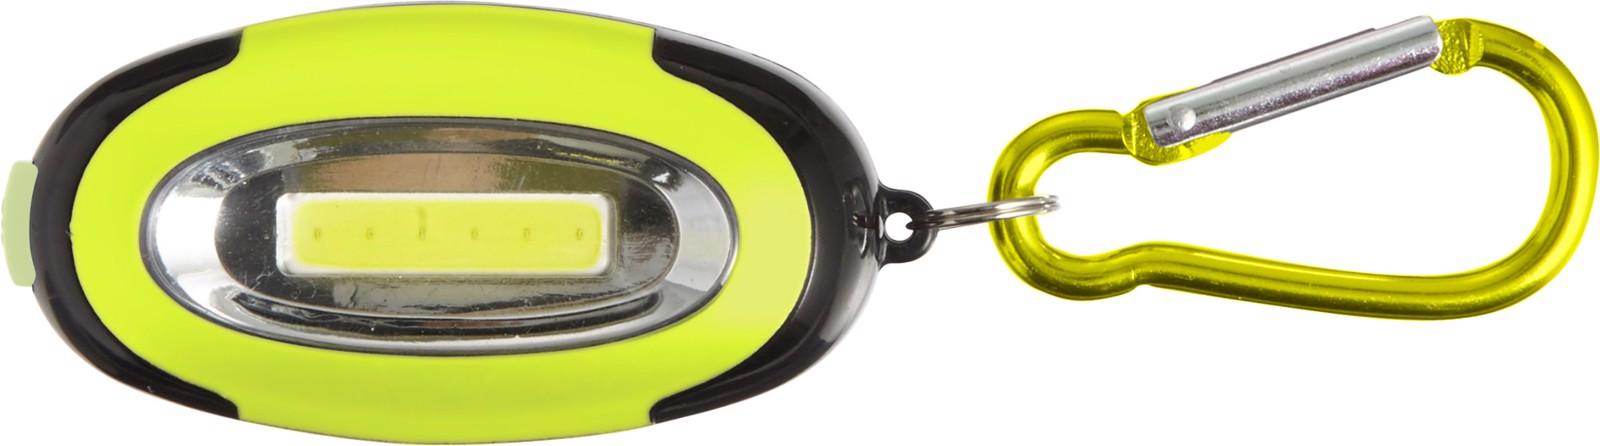 ABS light - Lime